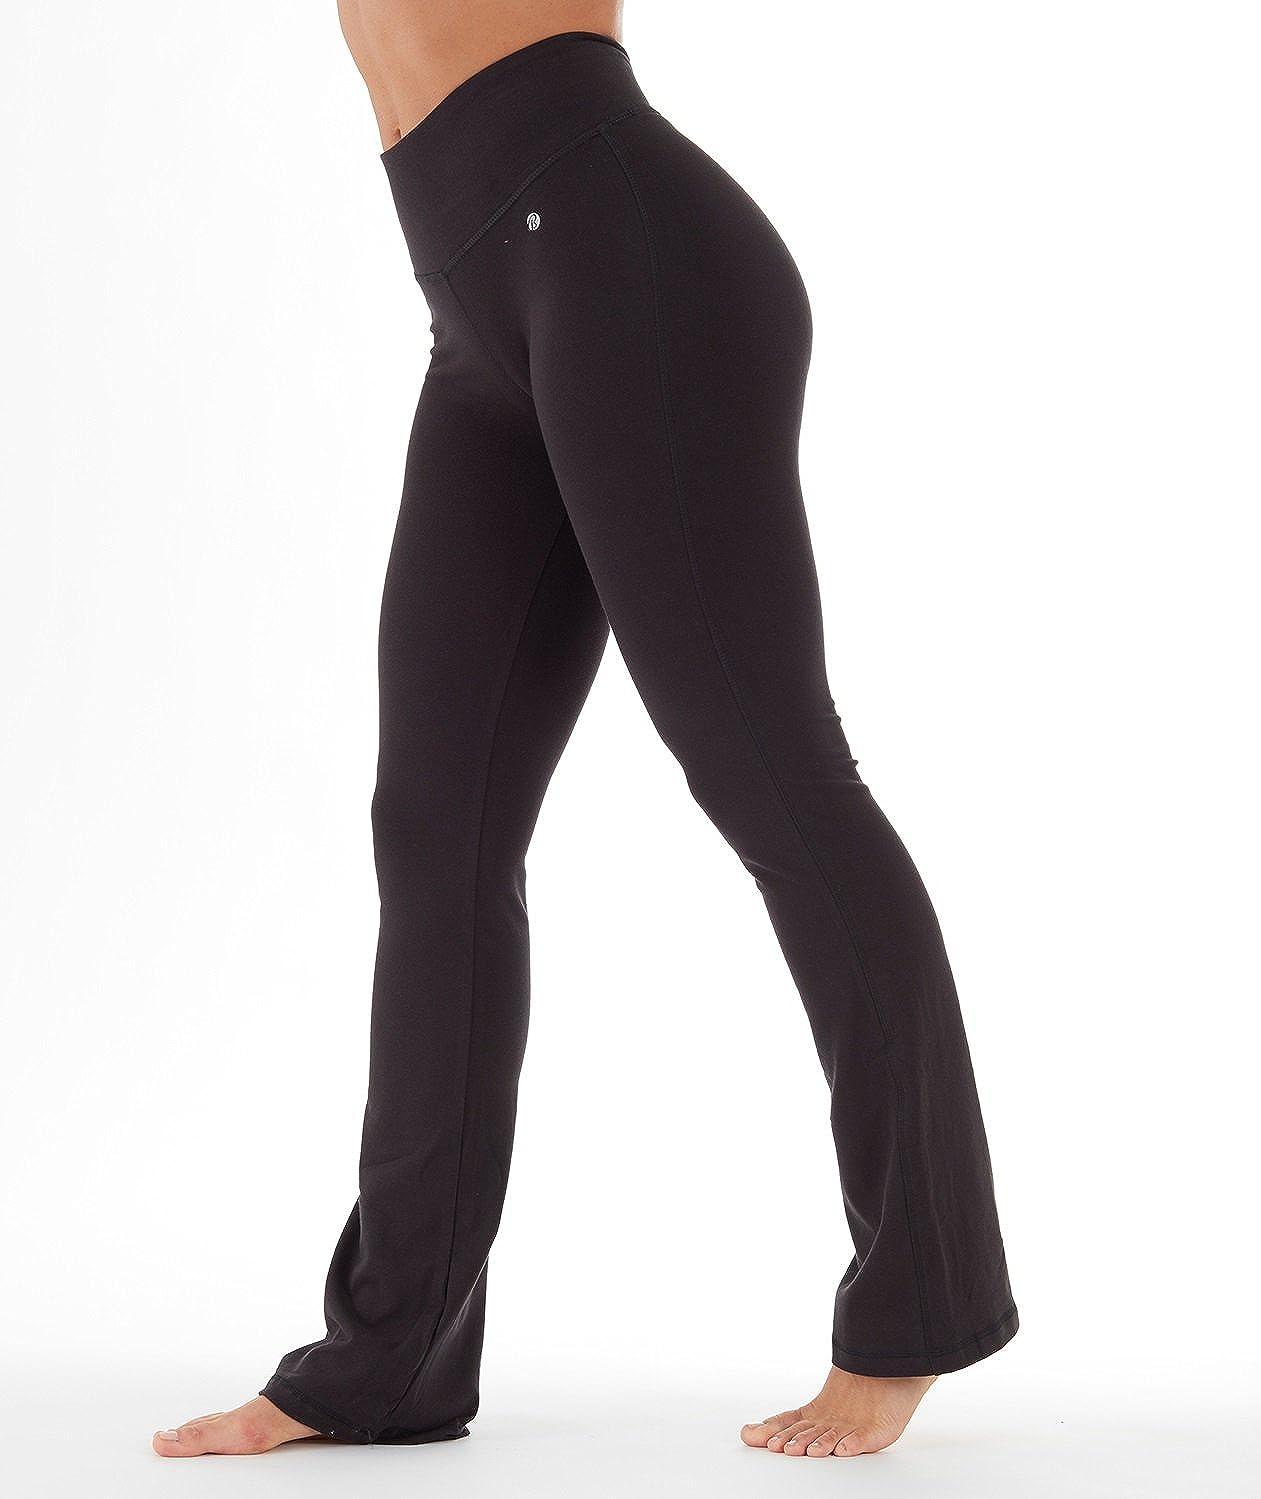 14c48f29bc7e1 Amazon.com : Bally Total Fitness Womens Tummy Control Long Pant 34